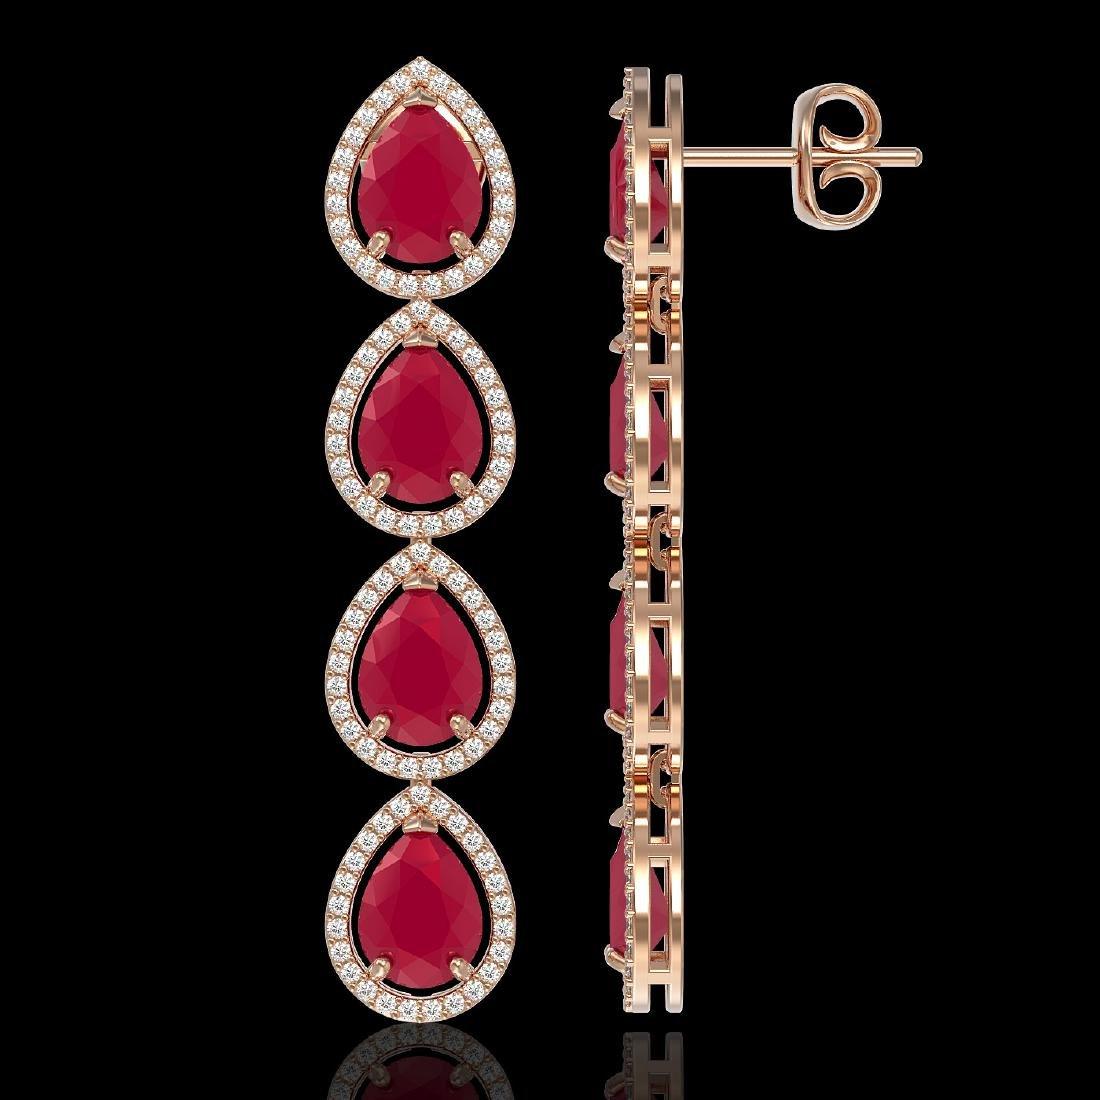 16.01 CTW Ruby & Diamond Halo Earrings 10K Rose Gold - 2